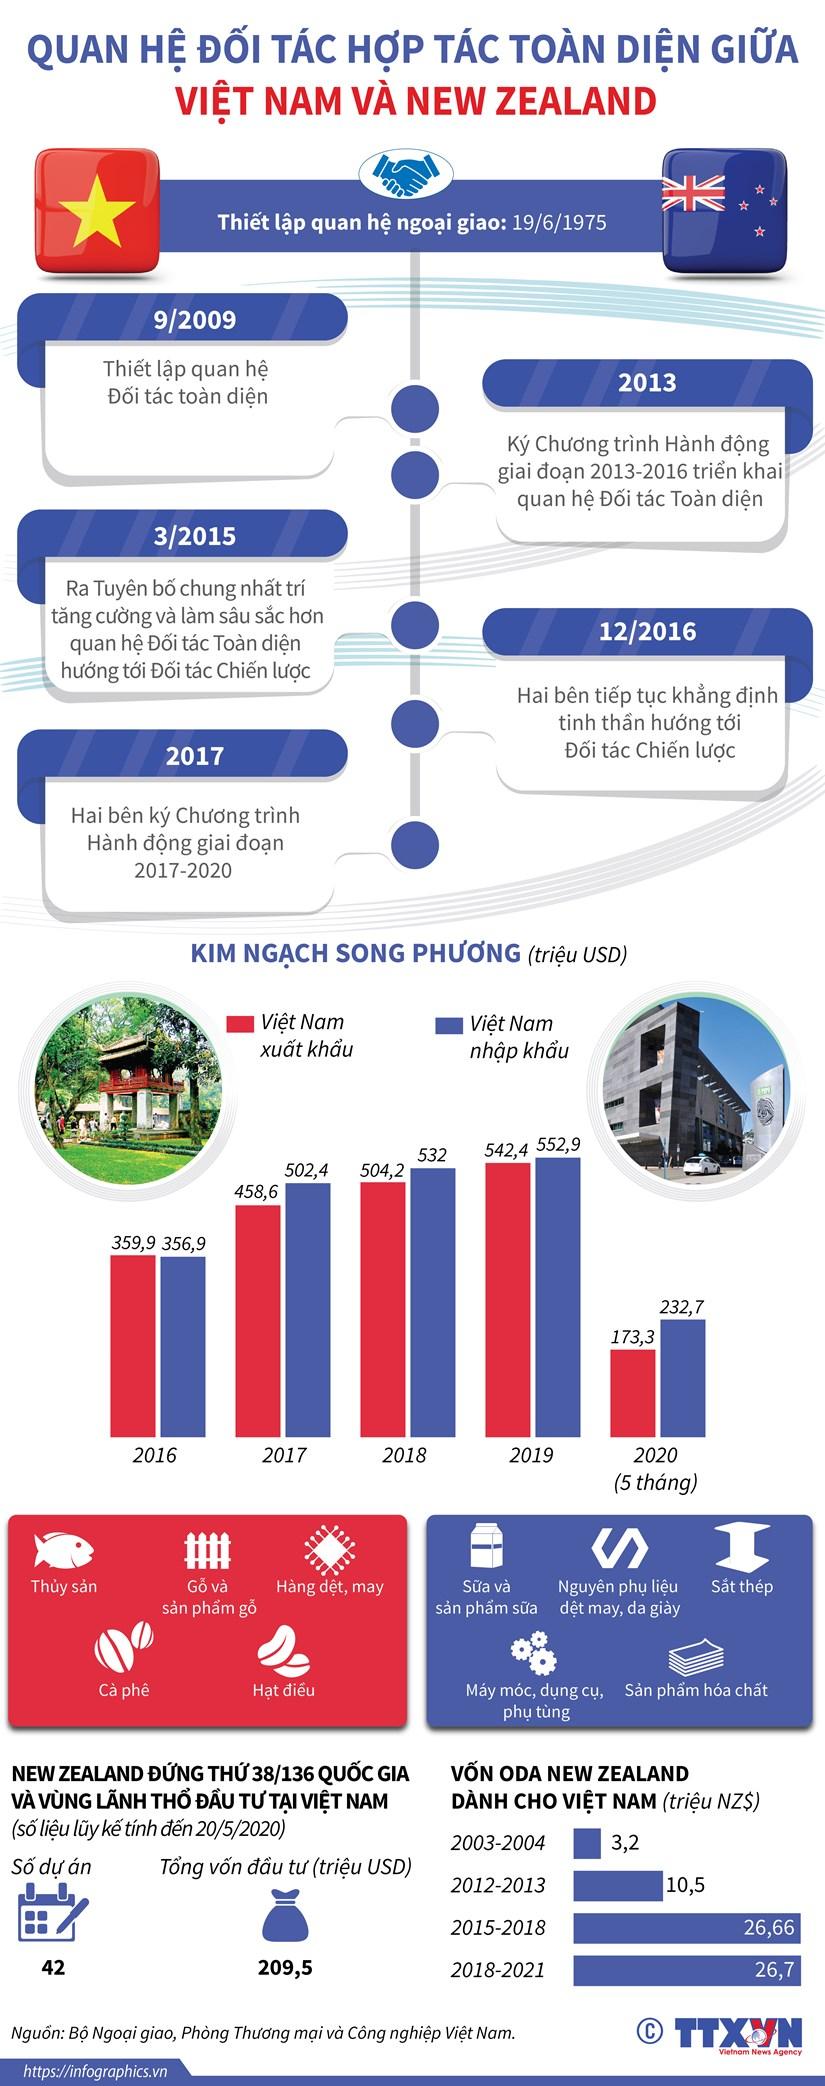 [Infographics] Quan he Doi tac toan dien giua Viet Nam-New Zealand hinh anh 1